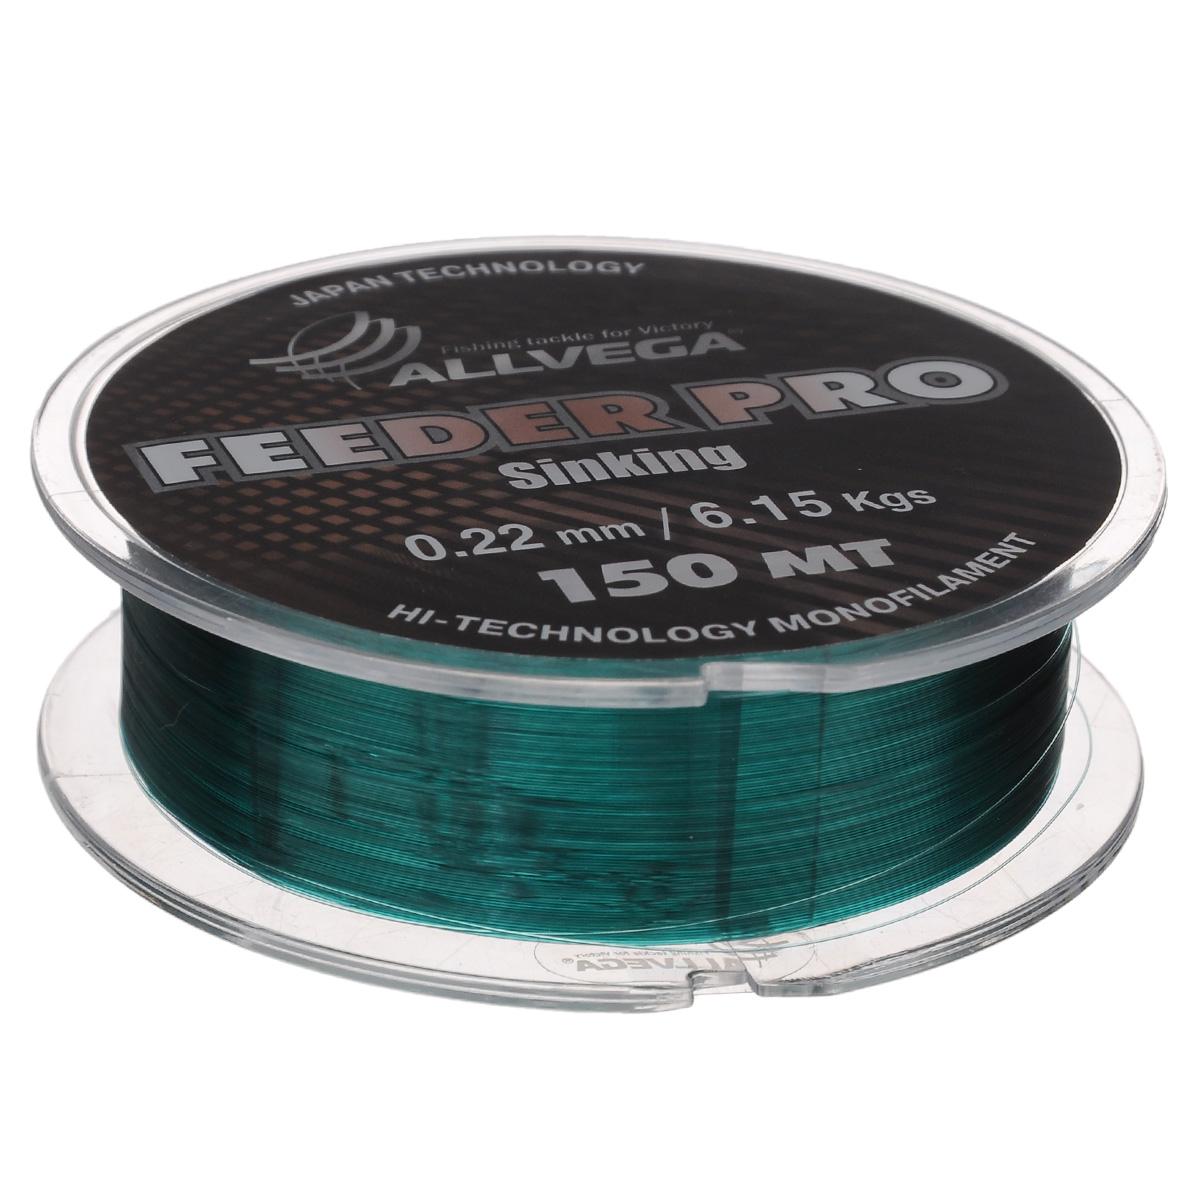 Леска Allvega Feeder Pro Sinking, цвет: темно-зеленый, 150 м, 0,22 мм, 6,15 кг